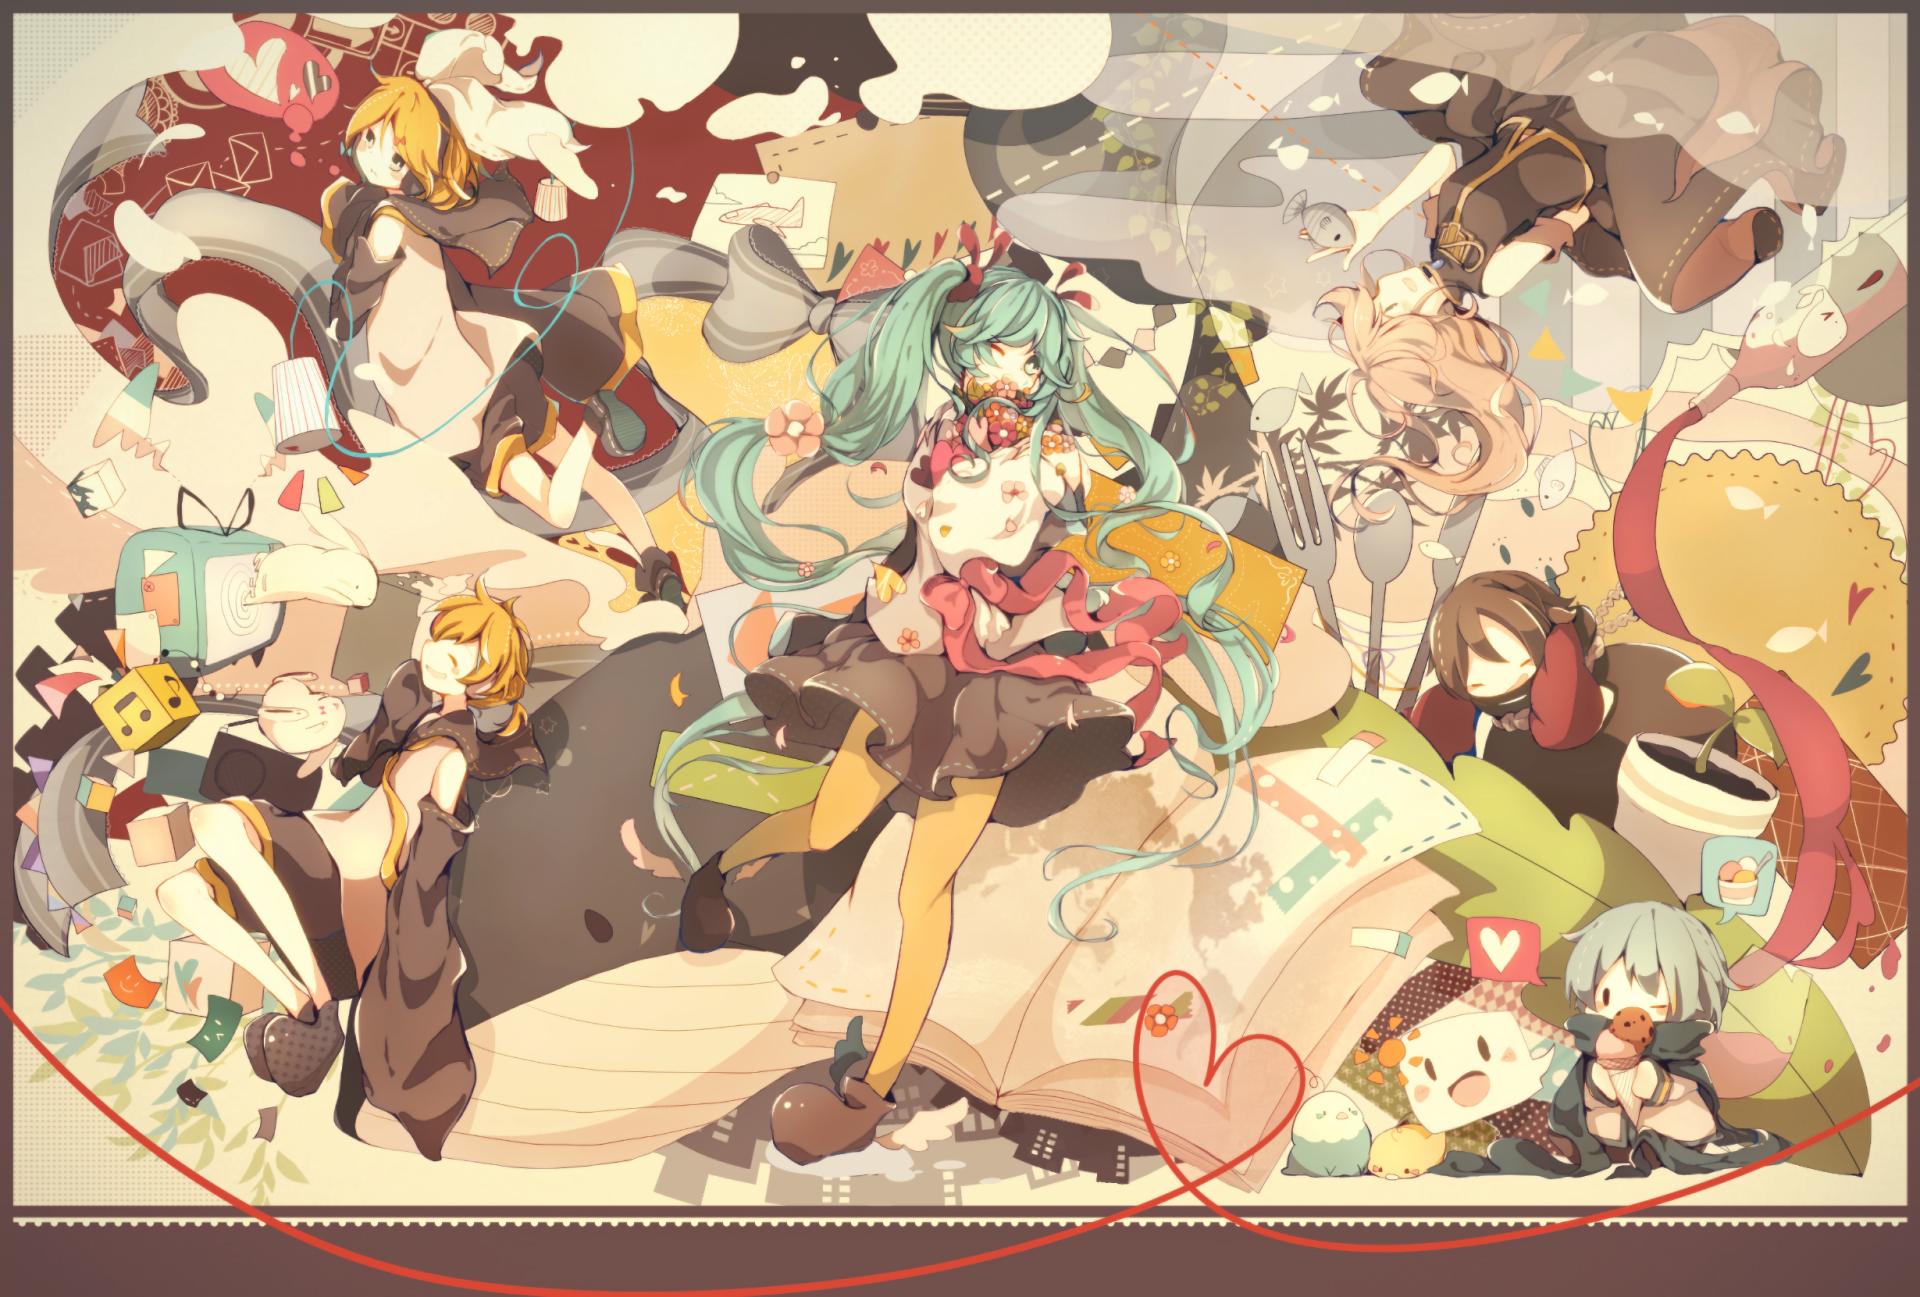 Anime - Vocaloid  Kaito (Vocaloid) Len Kagamine Rin Kagamine Meiko (Vocaloid) Luka Megurine Hatsune Miku Wallpaper